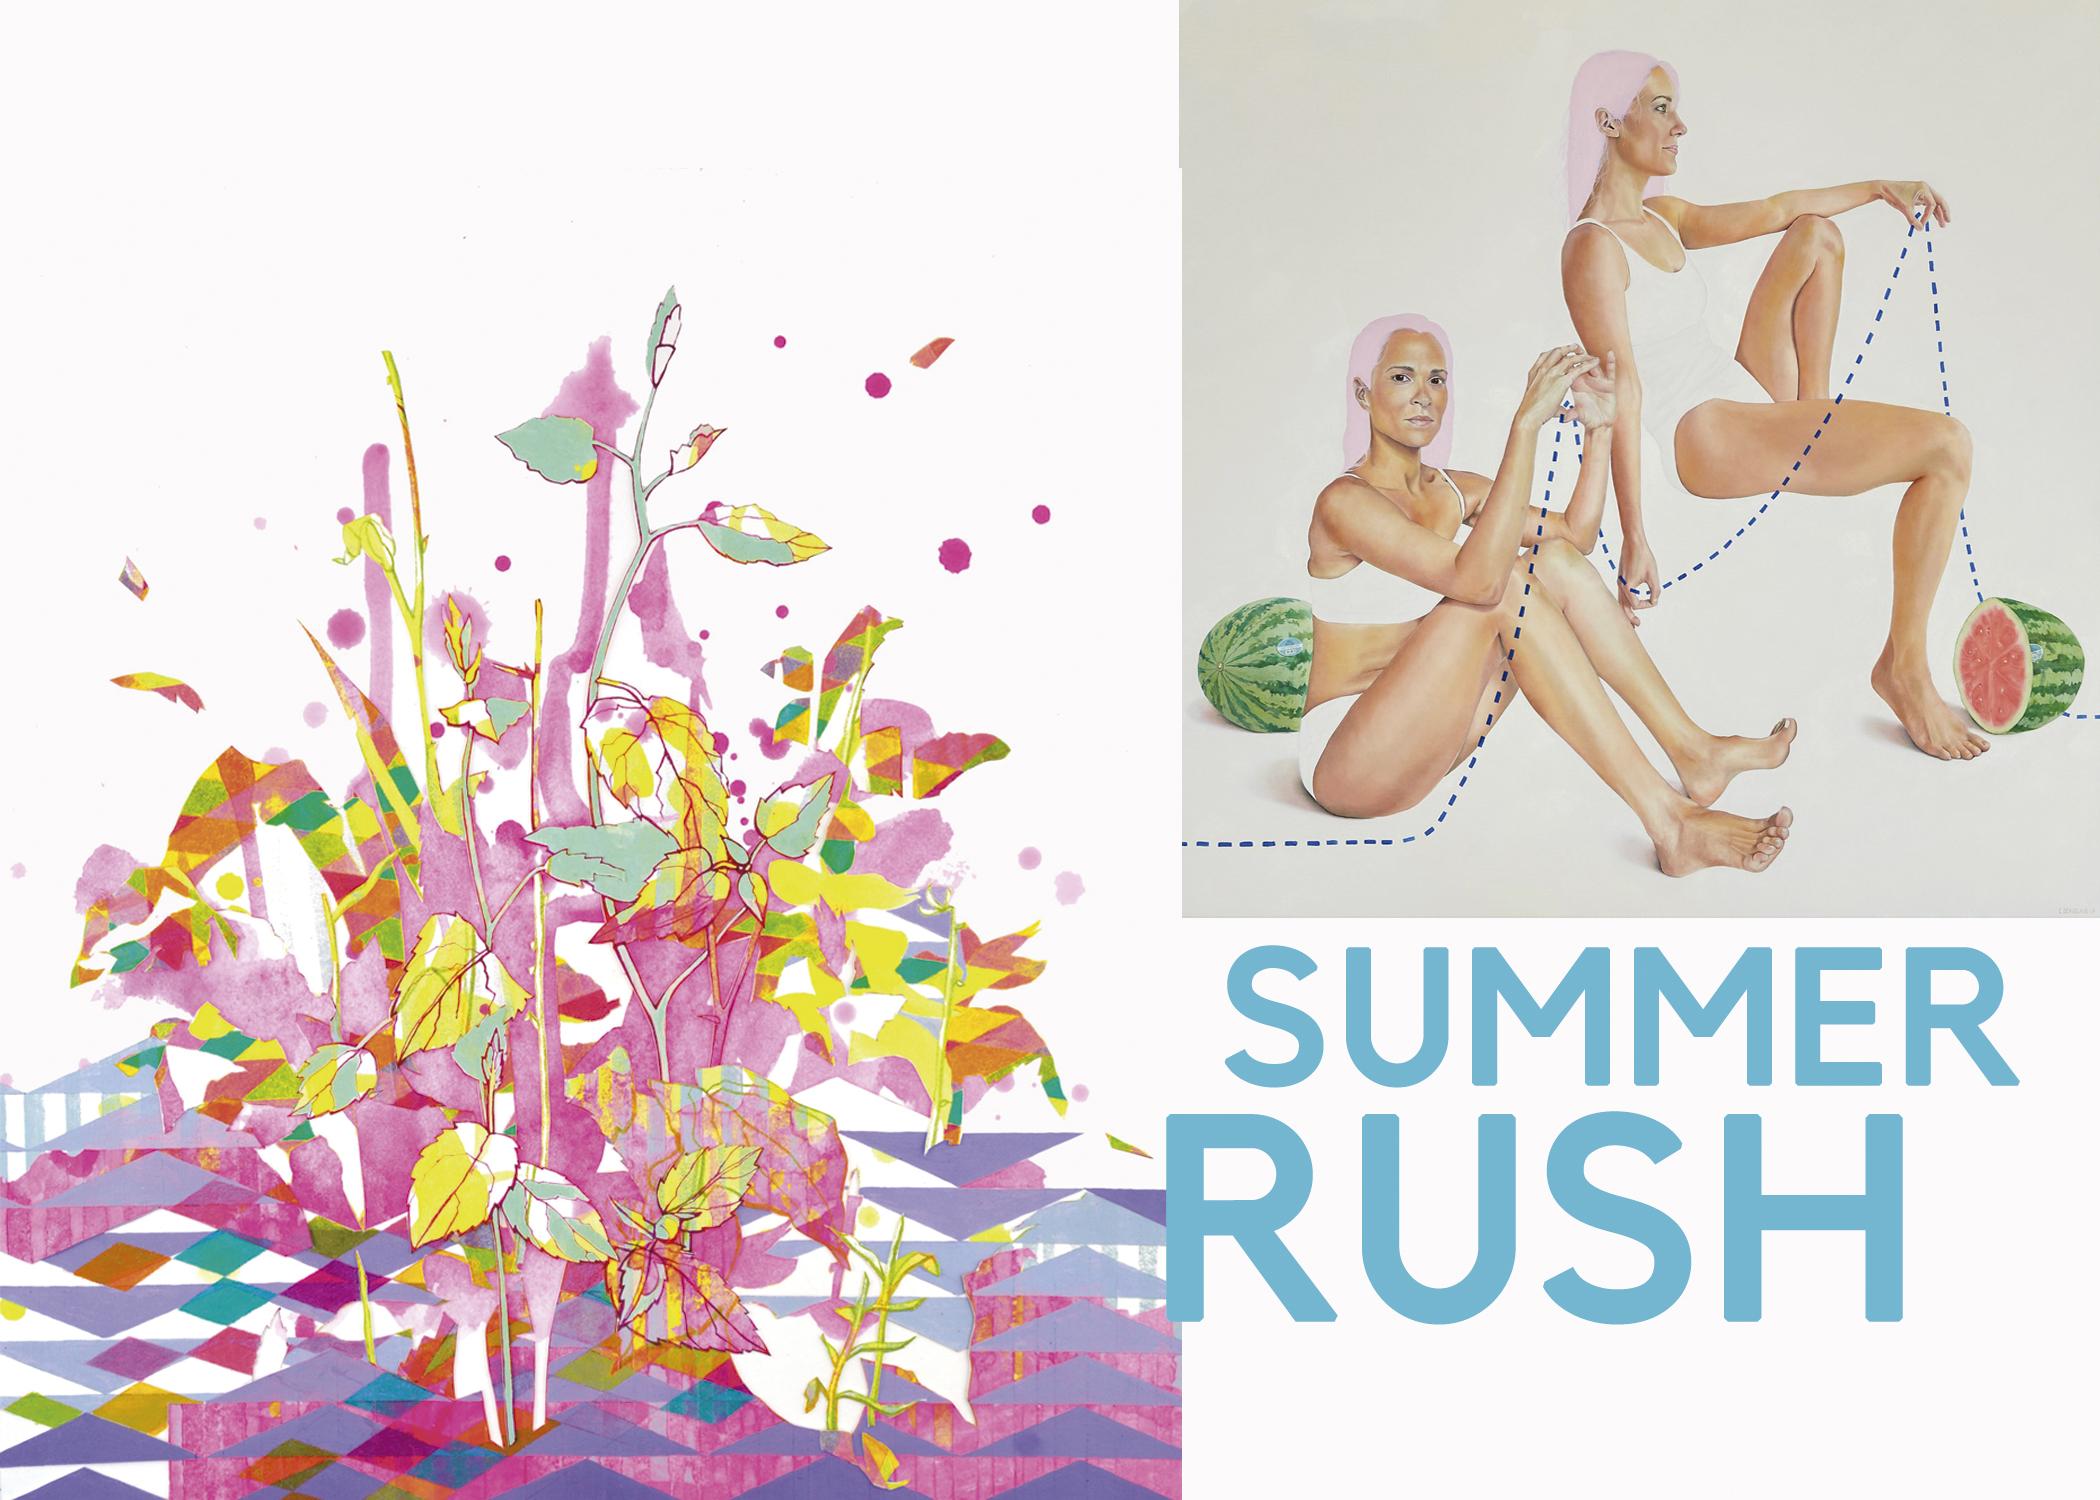 summer rush postcard frontrgb2.jpg